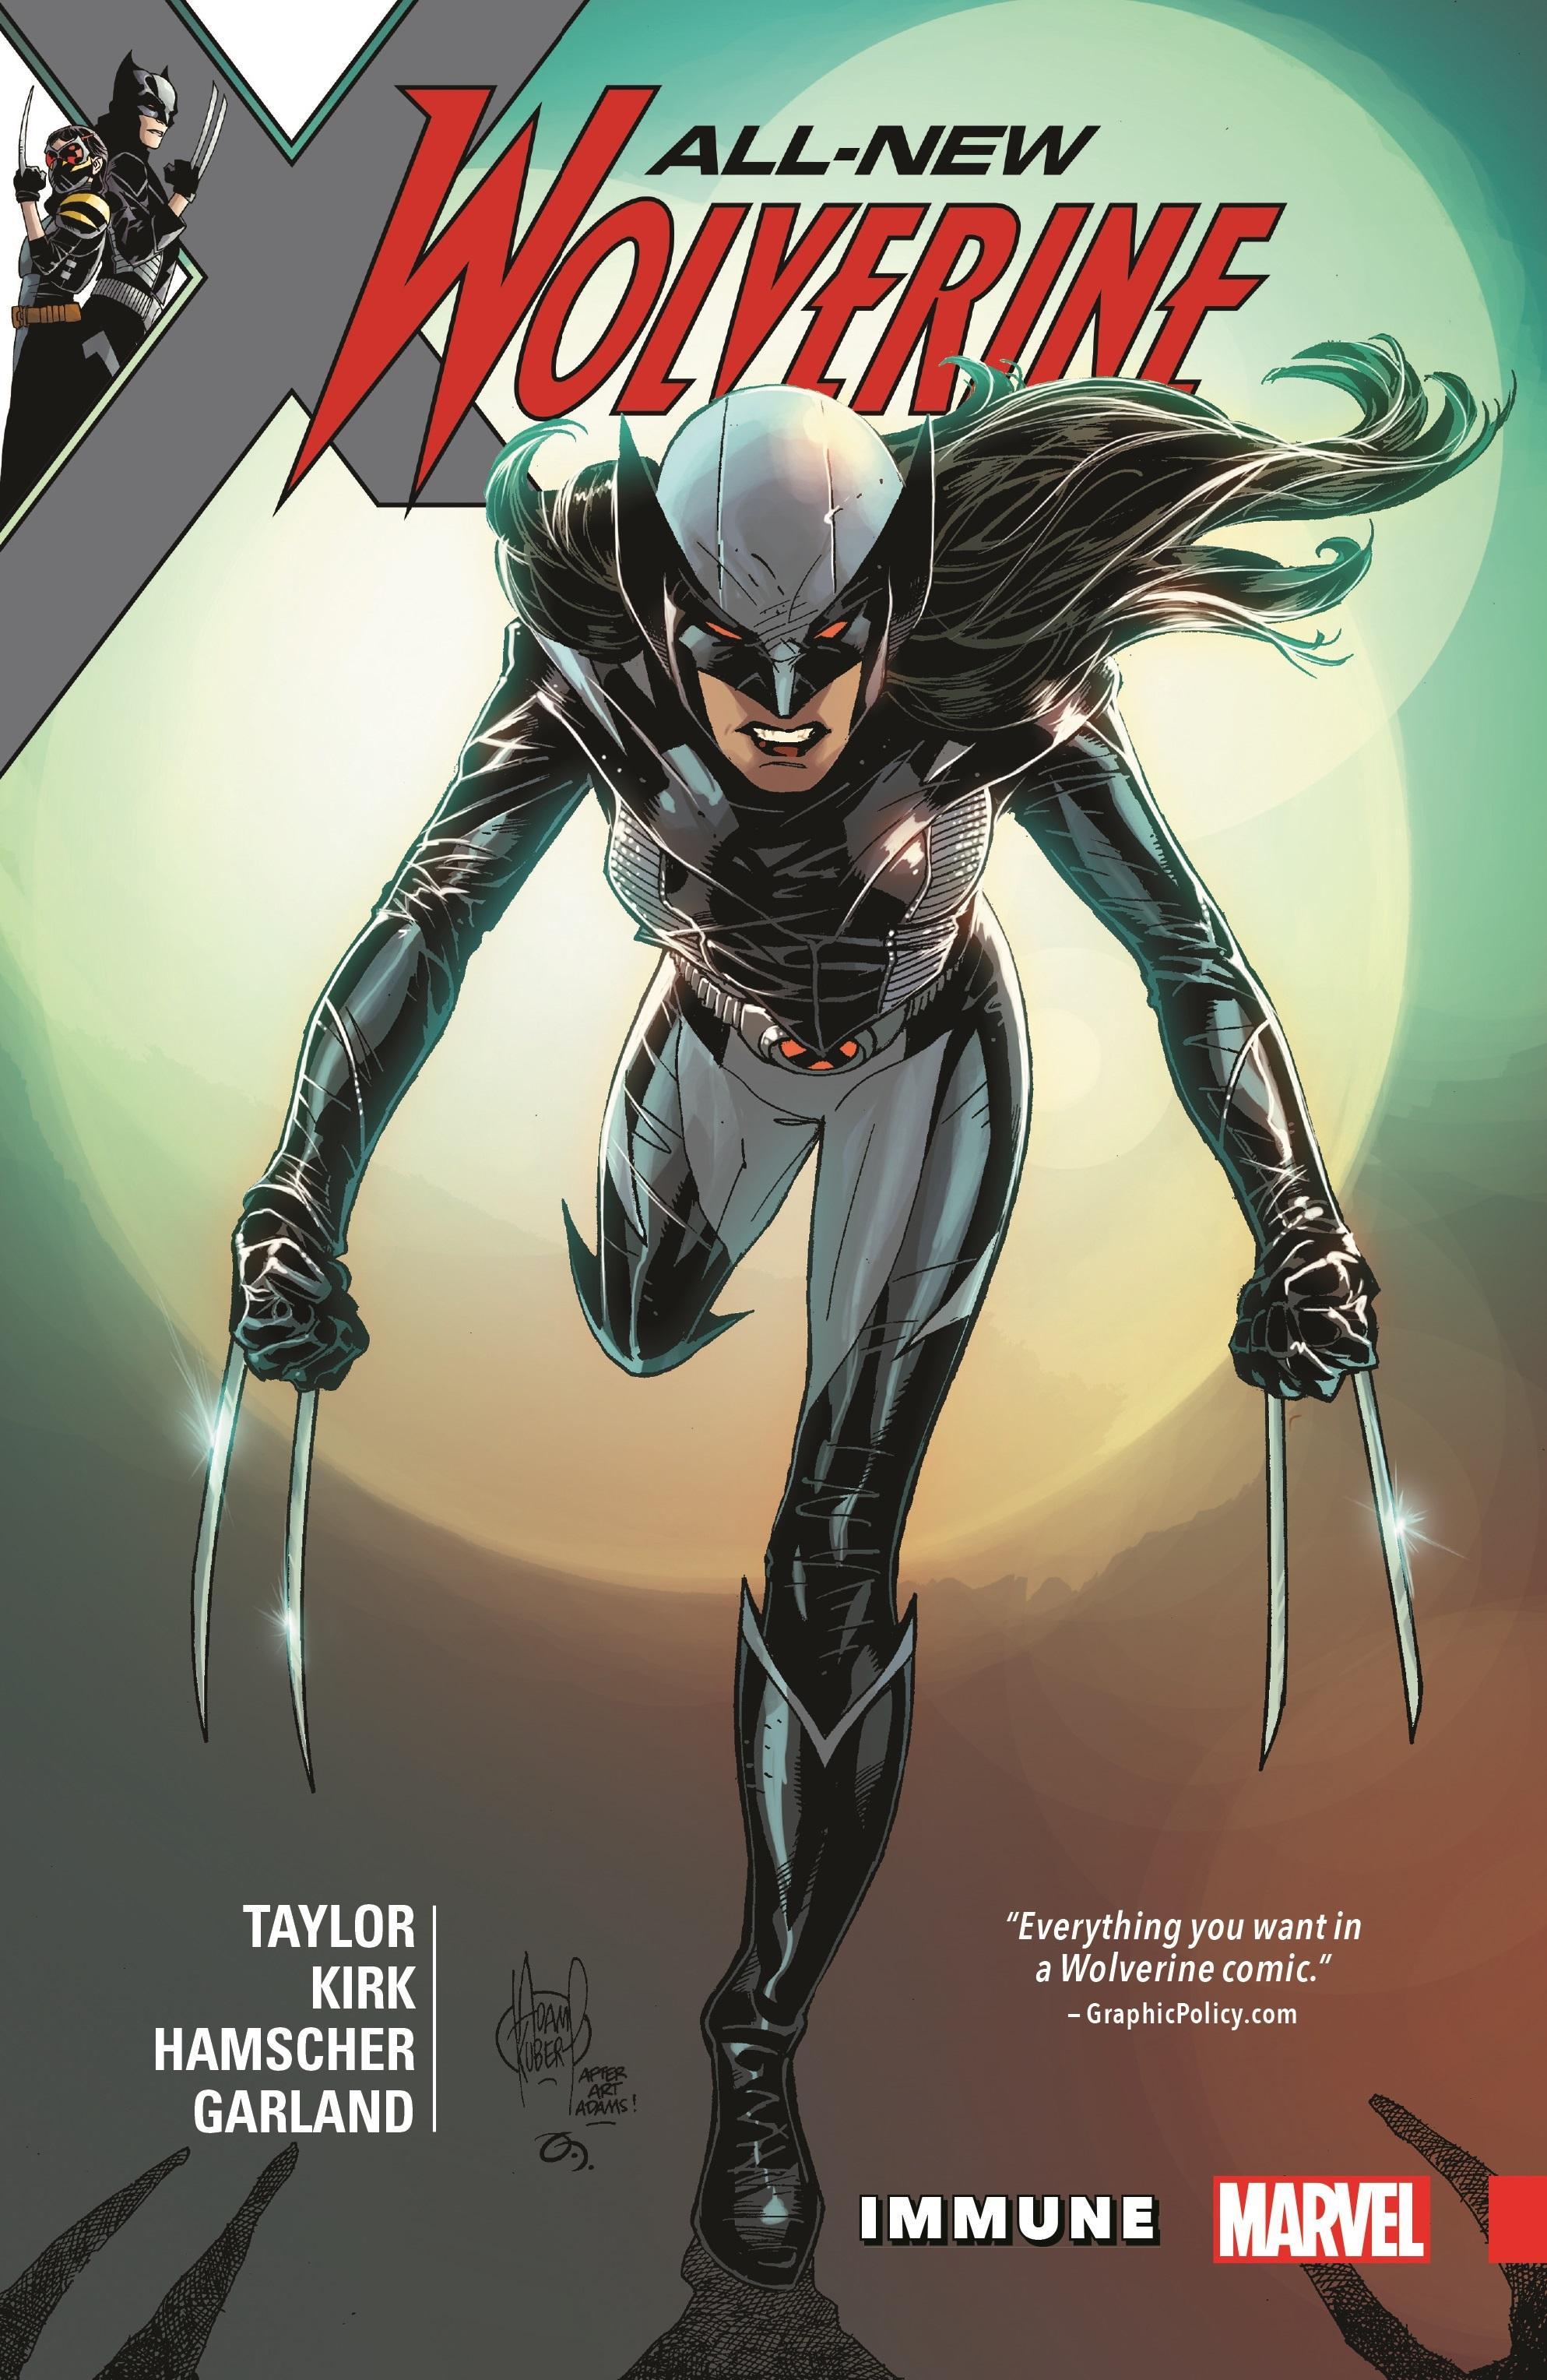 All-New Wolverine Vol. 4: Immune (Trade Paperback)